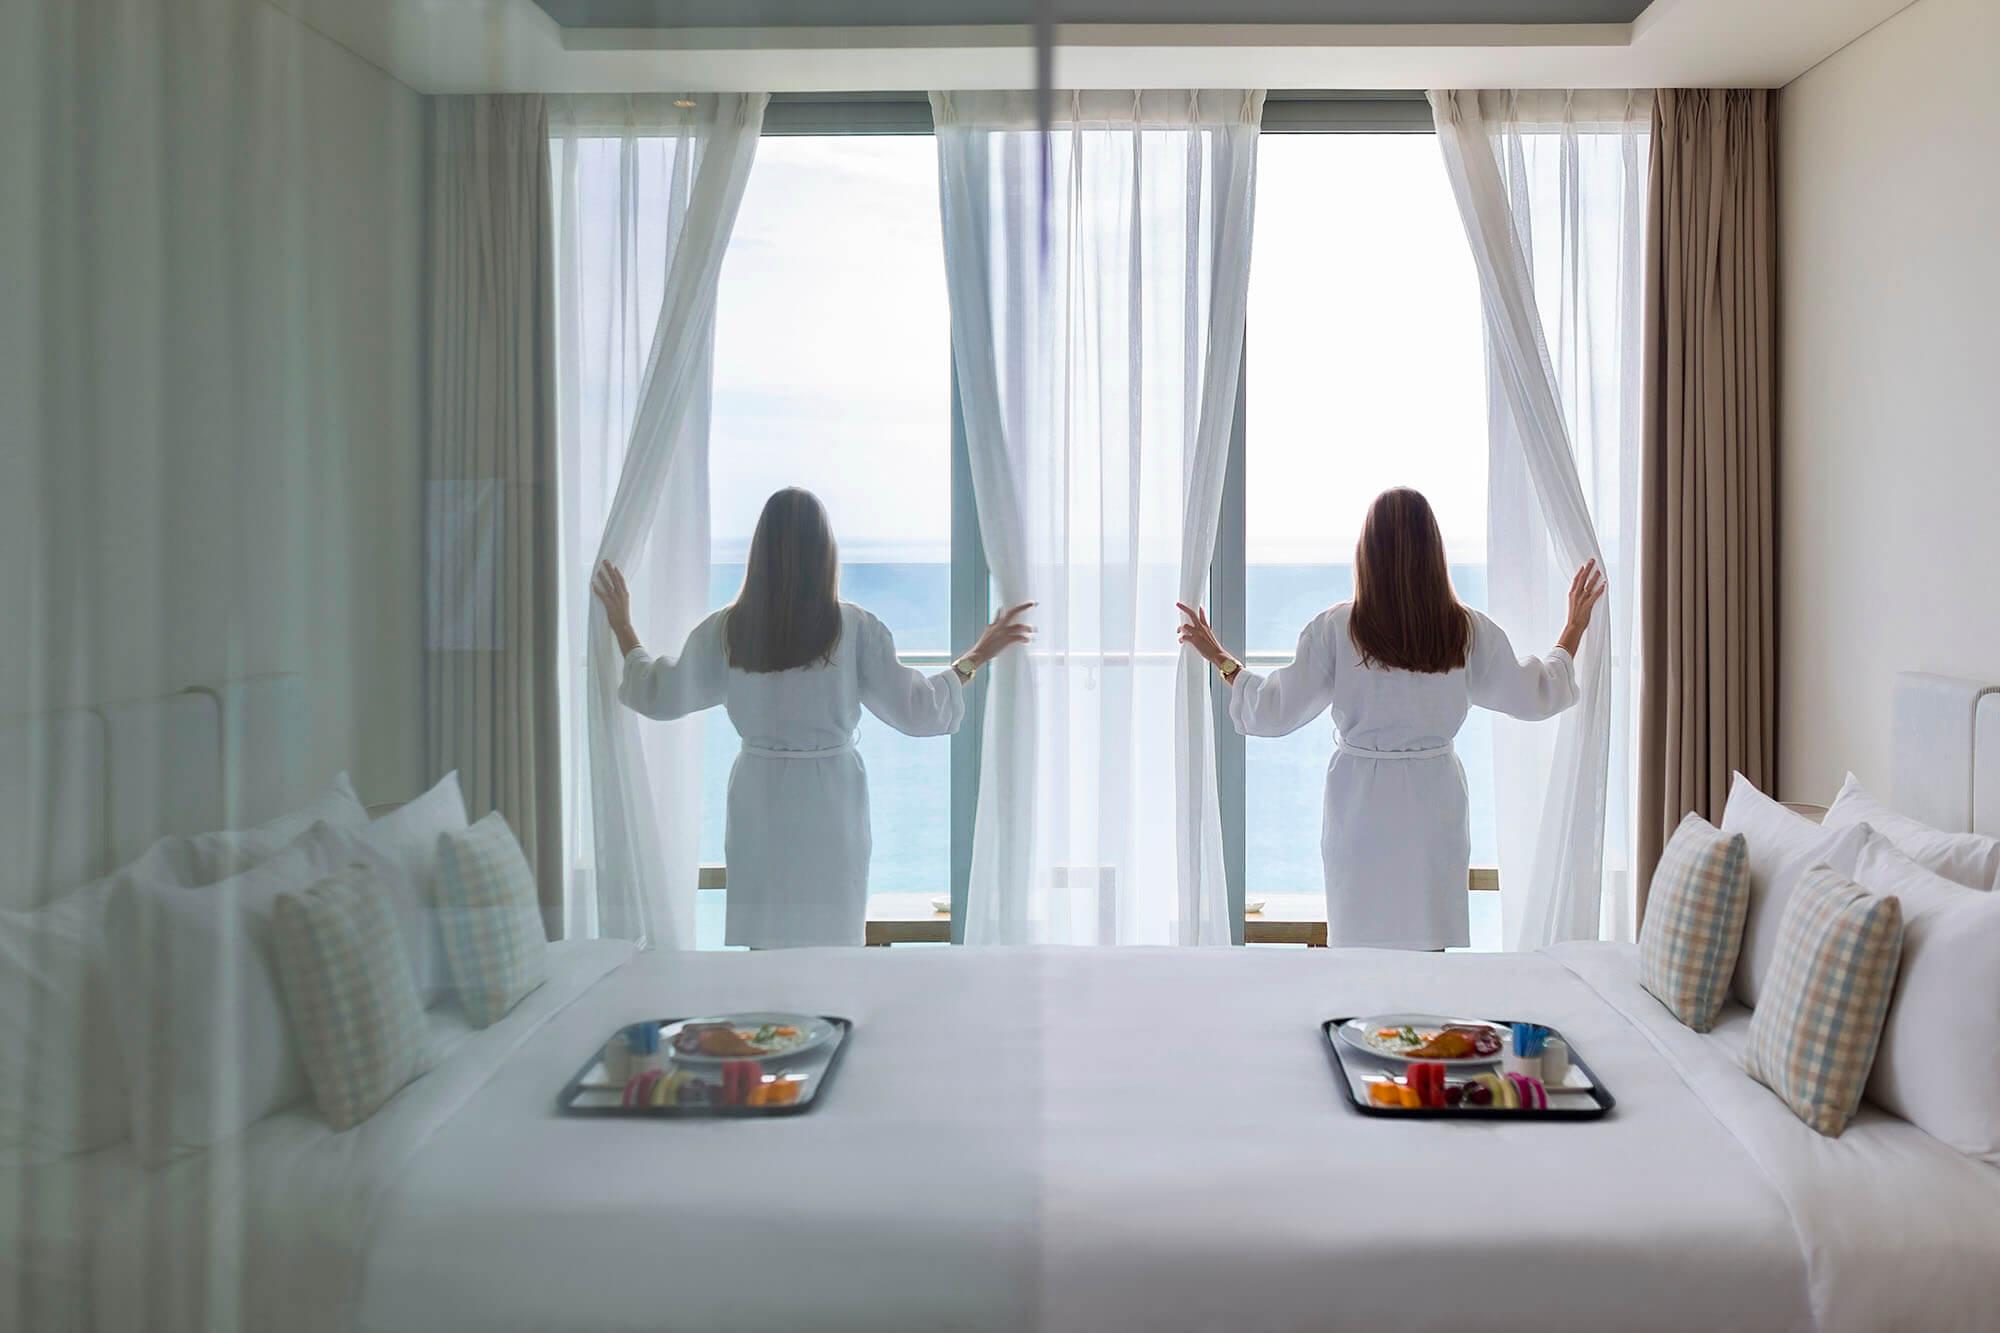 Delight Ocean View Apartment A La Carte Danang Beach Hotel 200 Vo Nguyen Giap Danang Fantasticity Com 04